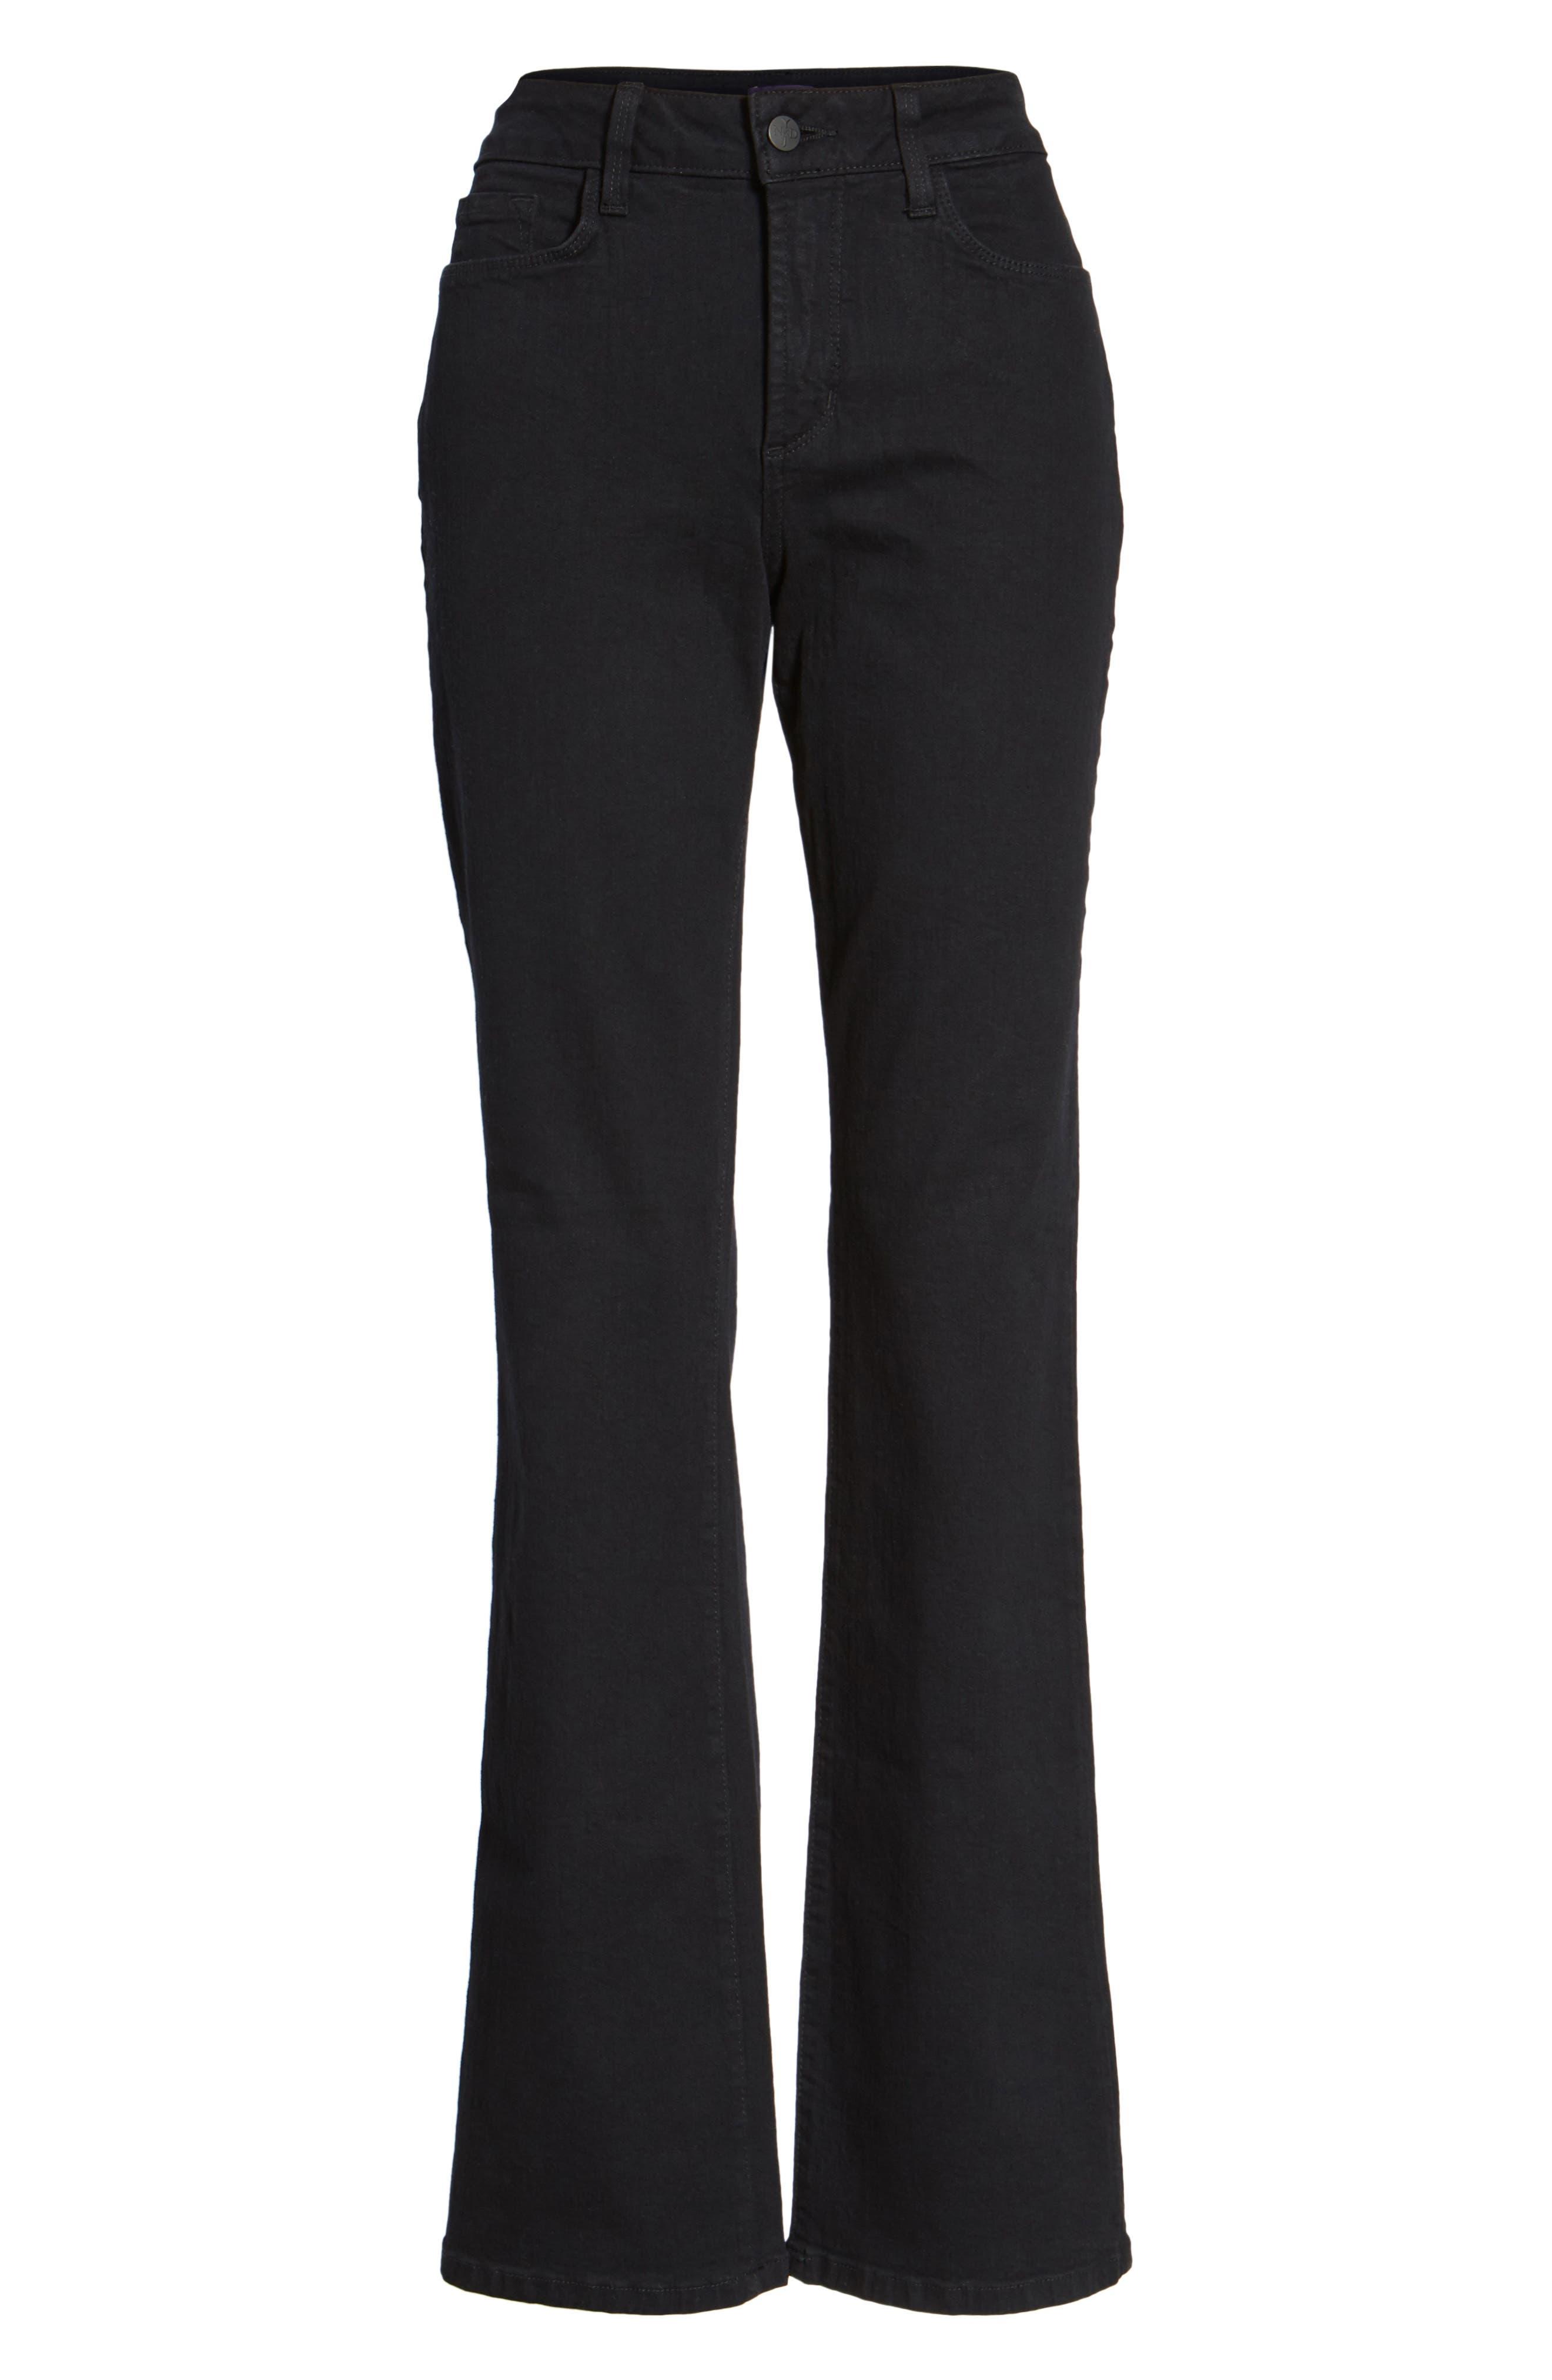 Barbara Stretch Bootcut Jeans,                             Main thumbnail 1, color,                             001